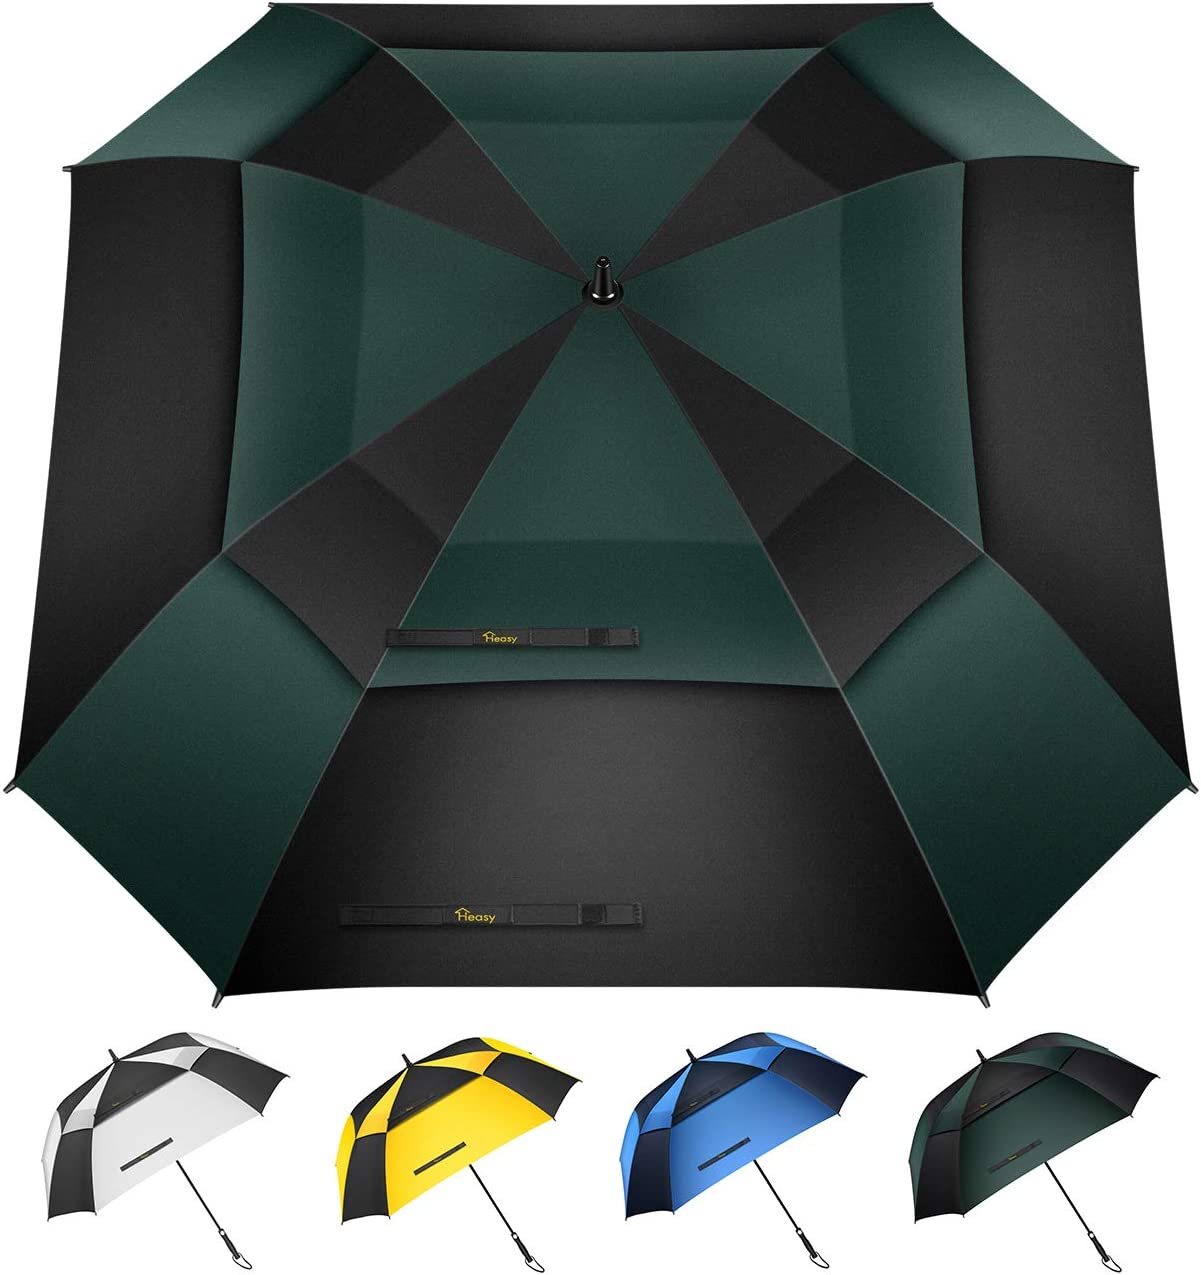 YSCY Portable/Umbrella 8K Long Handle Art Umbrella Elegant and Simple Wood Curved Hook Handle Floral Student Automatic Umbrella Radiation/Protection,UV/Protection,Rust/Prevention,Wind/Protection.